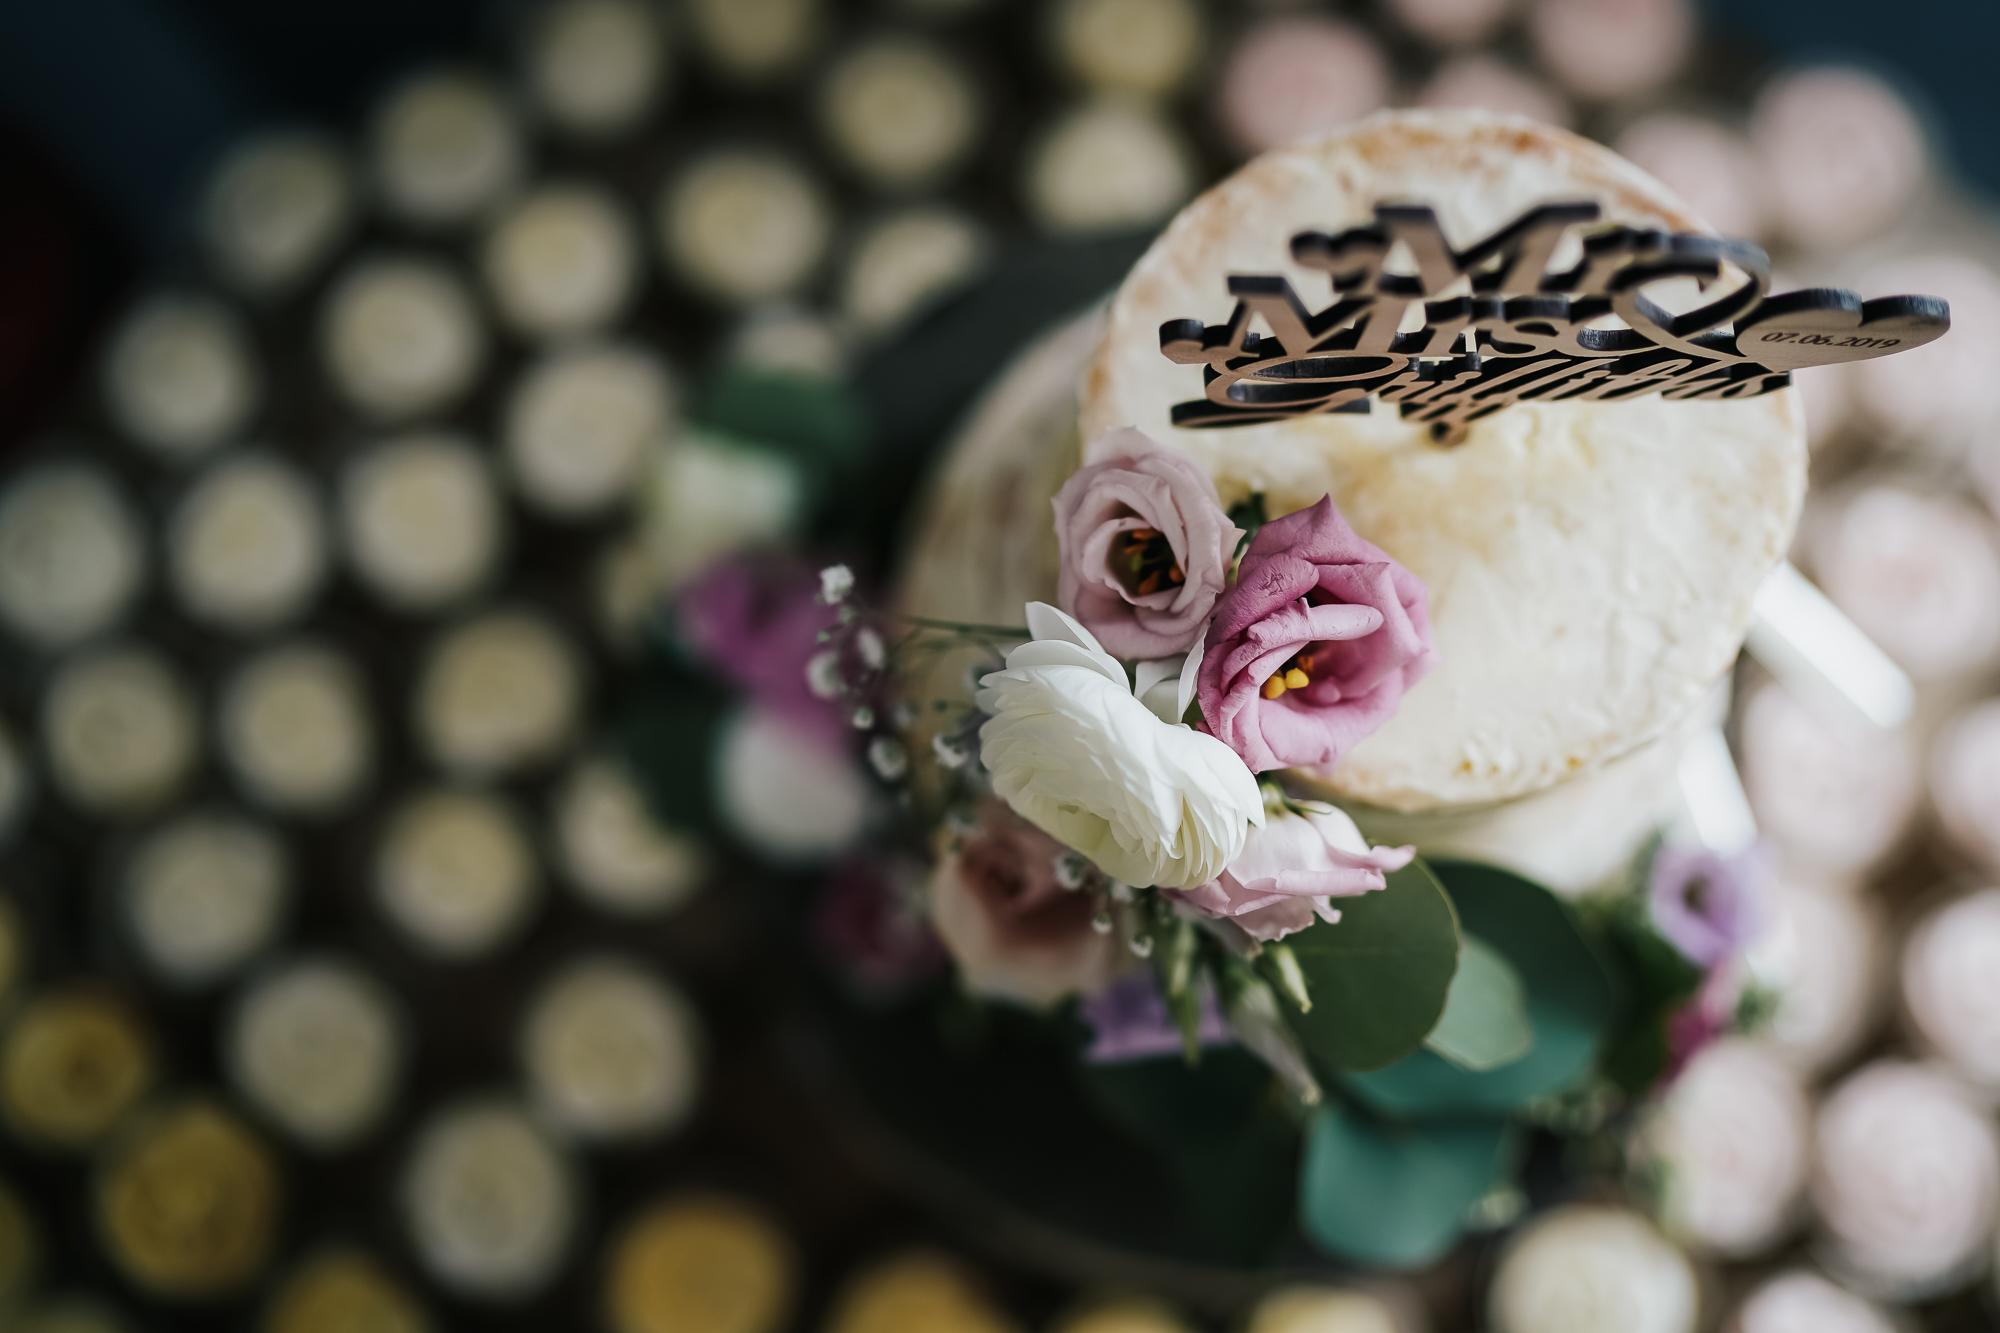 The Hayloft Wedding Photography Cheshire wedding photographer (39 of 52).jpg